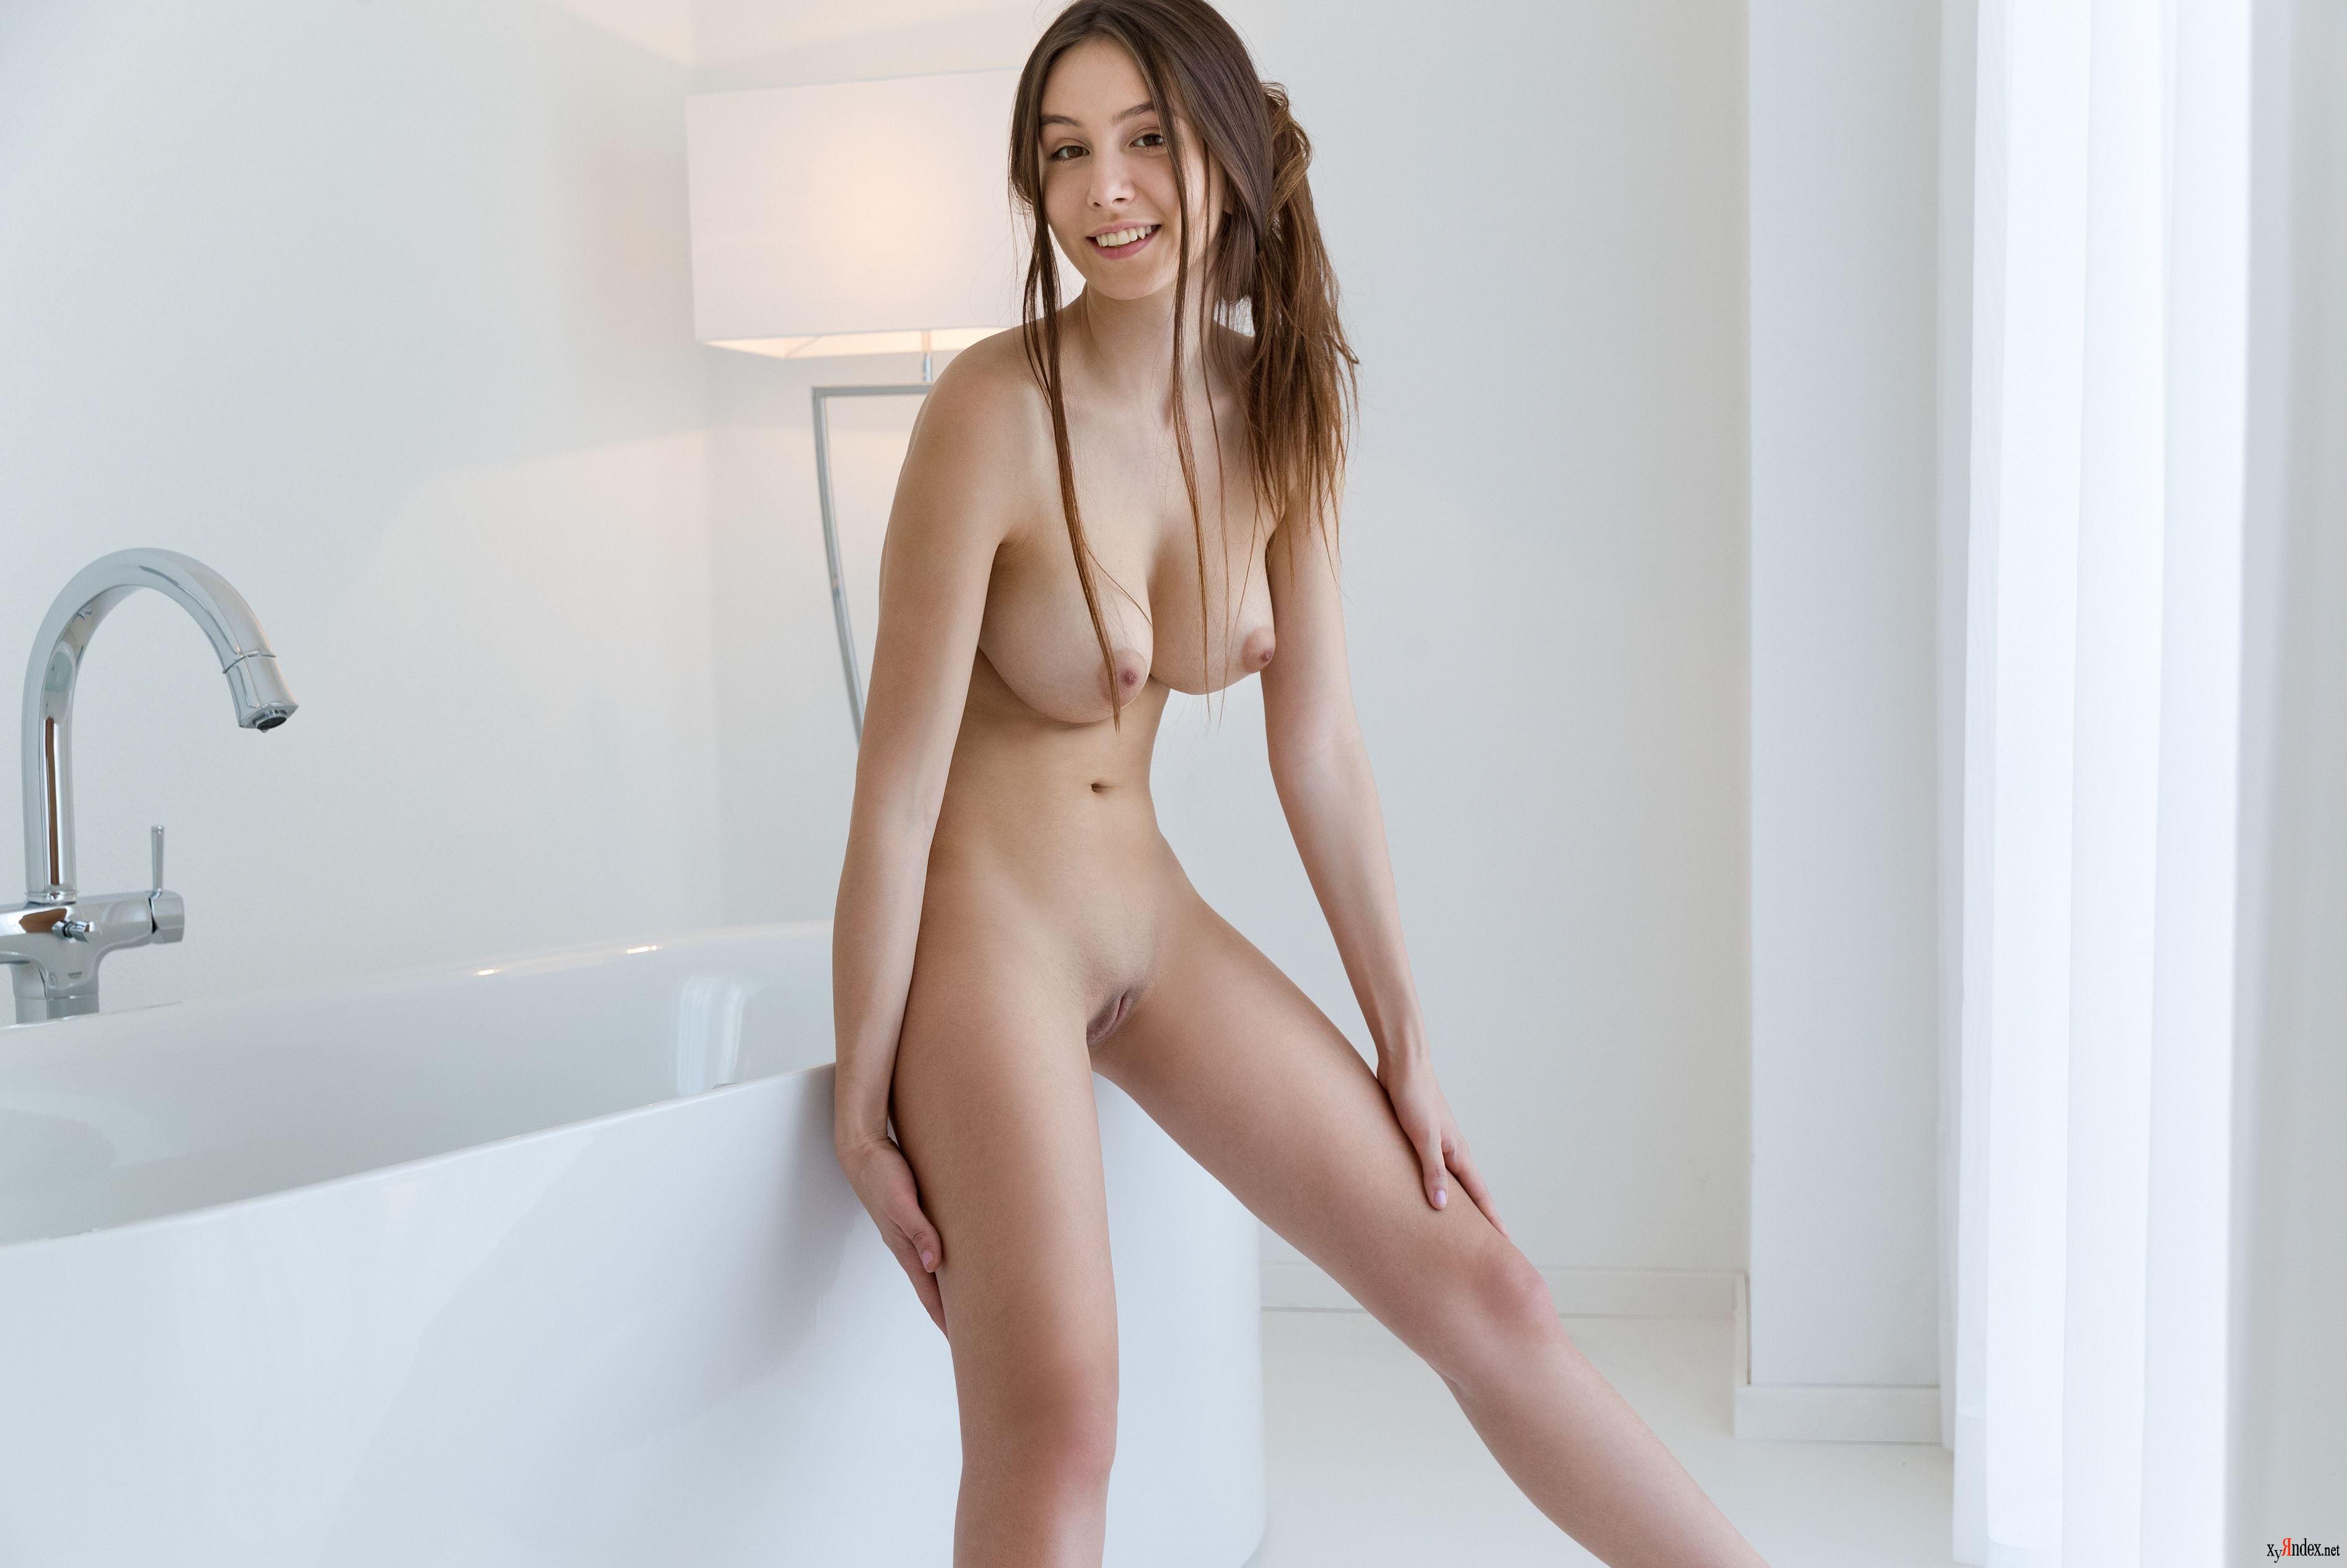 Alesha dixon sexy photos